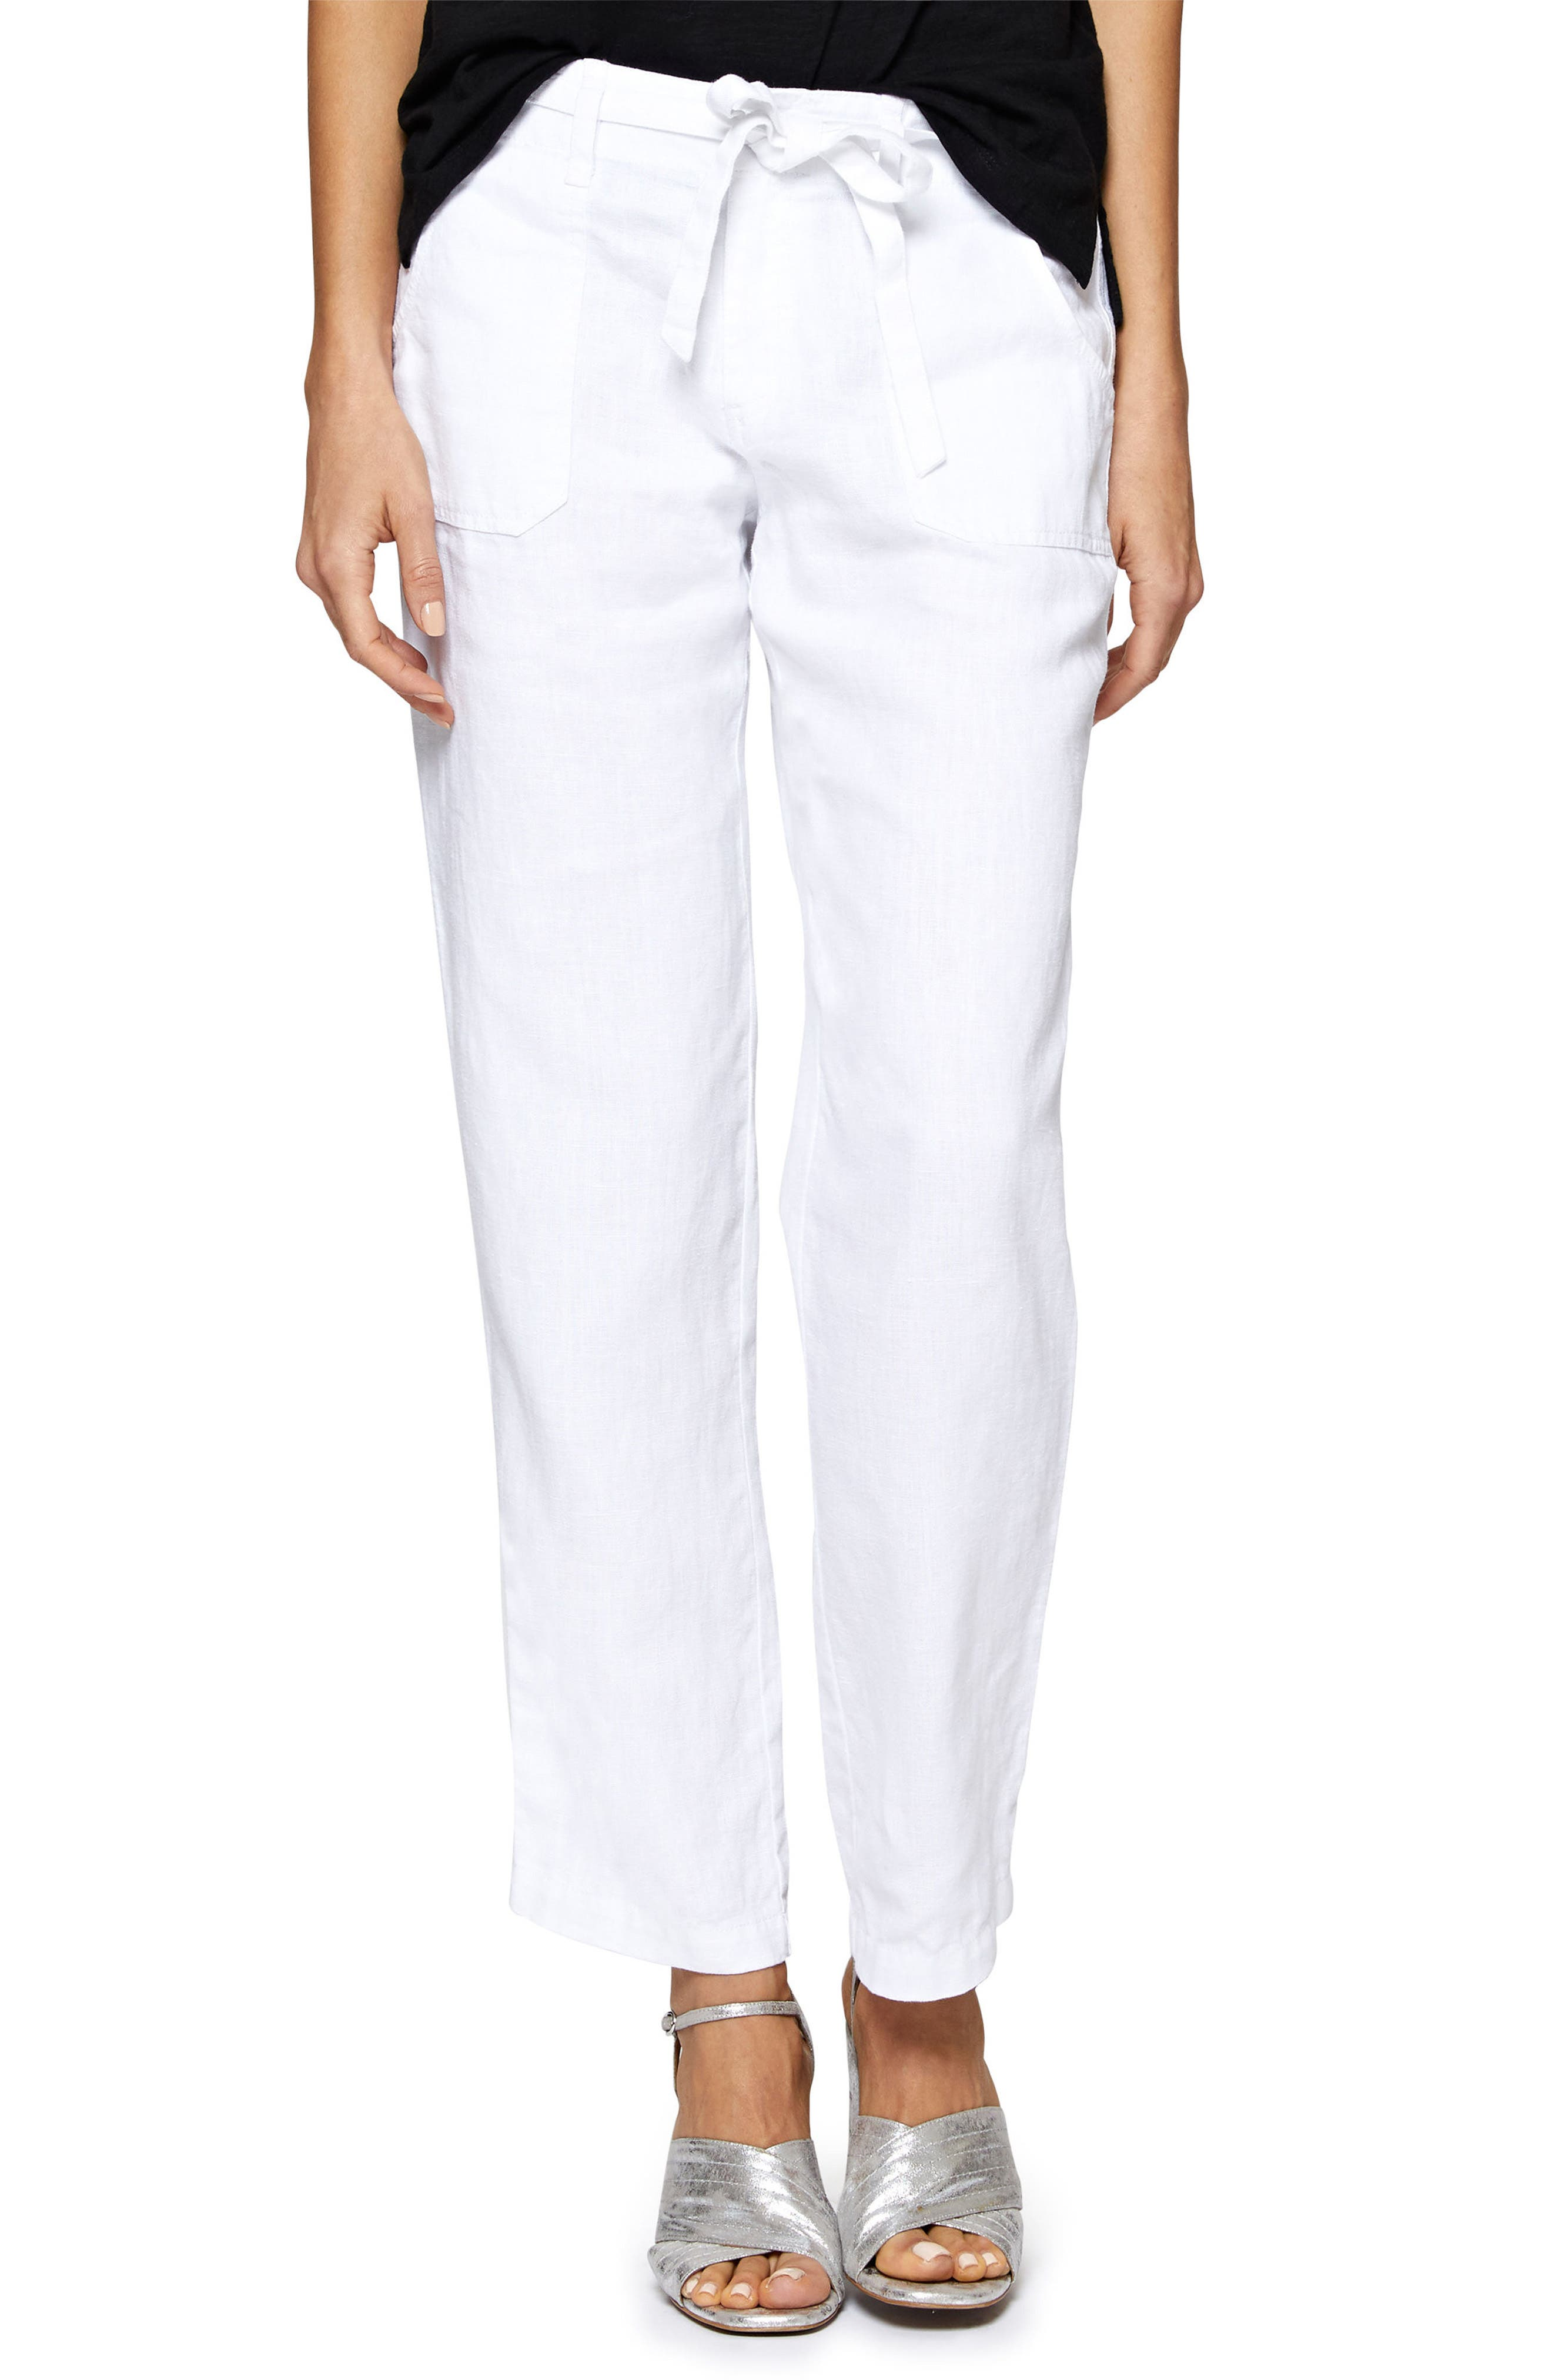 Beachcomber Linen Pants,                             Main thumbnail 1, color,                             White